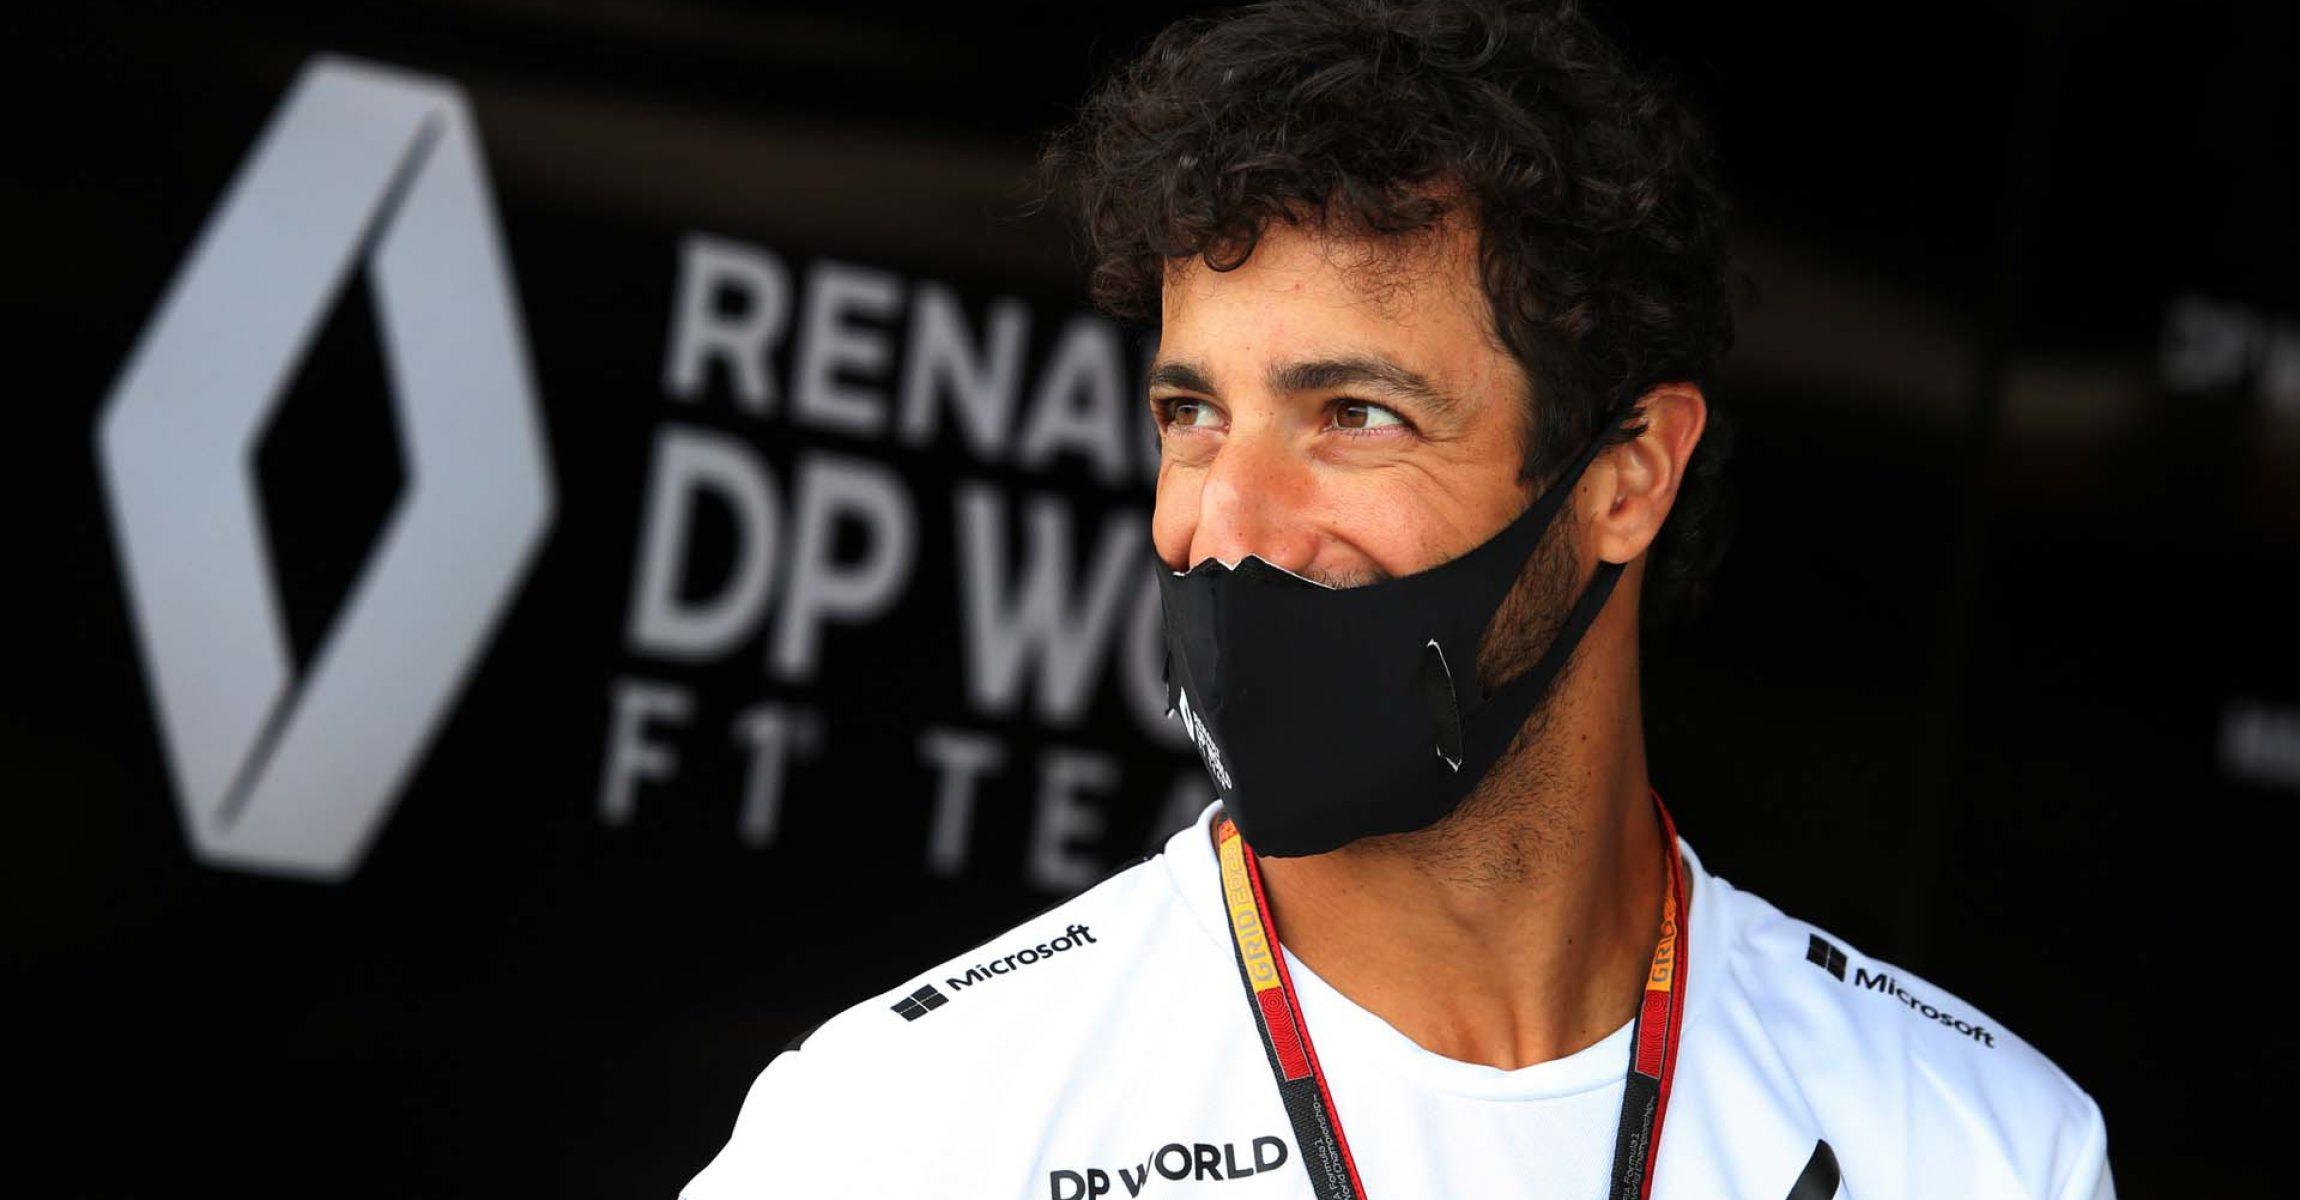 Daniel Ricciardo (AUS) Renault F1 Team. Hungarian Grand Prix, Thursday 16th July 2020. Budapest, Hungary.